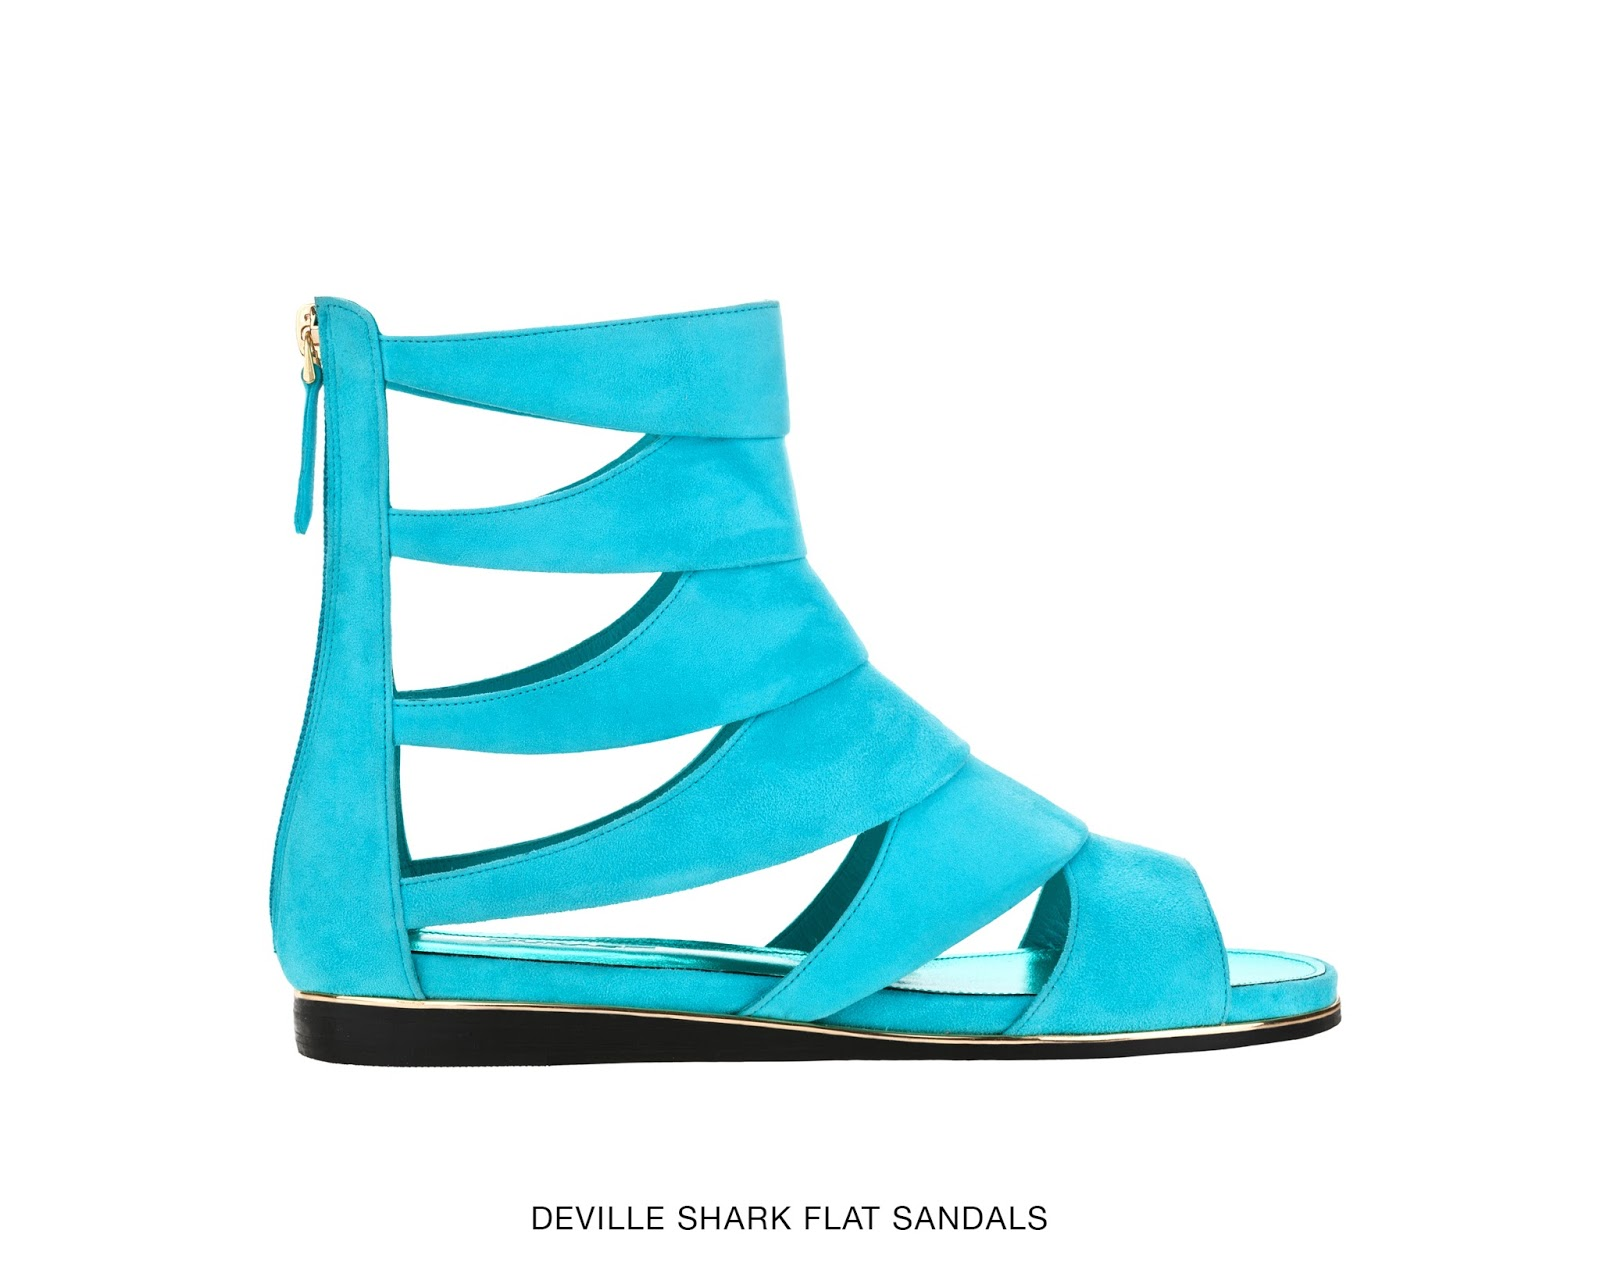 4dbd9292f38 DUKAS Άνοιξη Καλοκαίρι 2016. Η νέα συλλογή παπουτσιών του Δούκα ...